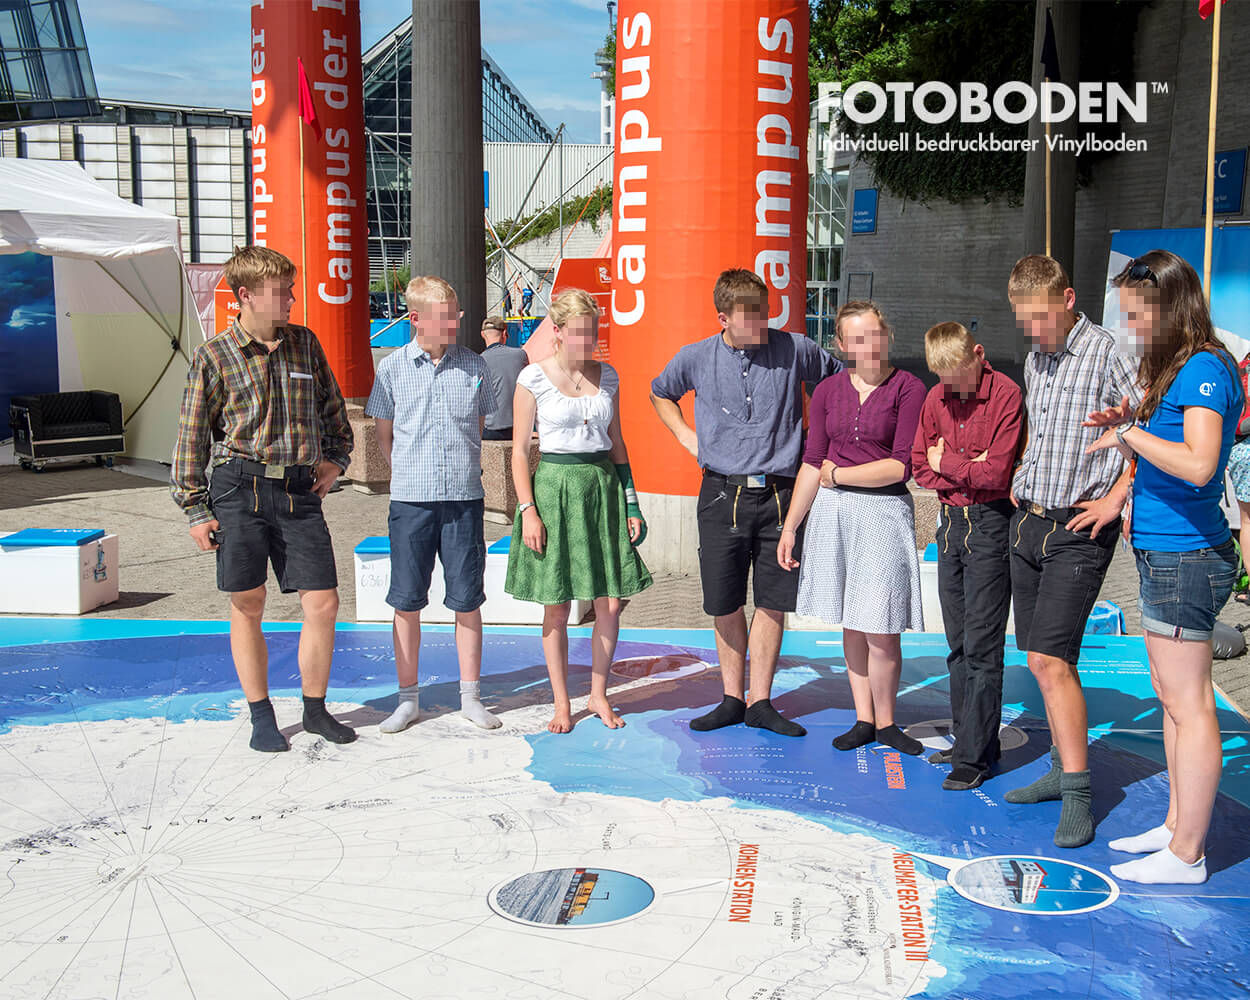 Antarktiskarte IdeenExpo Hannover 3Ausstellung Museum  Raumkonzept Stimmung Museumsboden Ausstellungsboden Fotoboden Vinylboden Flooring Individuell Event